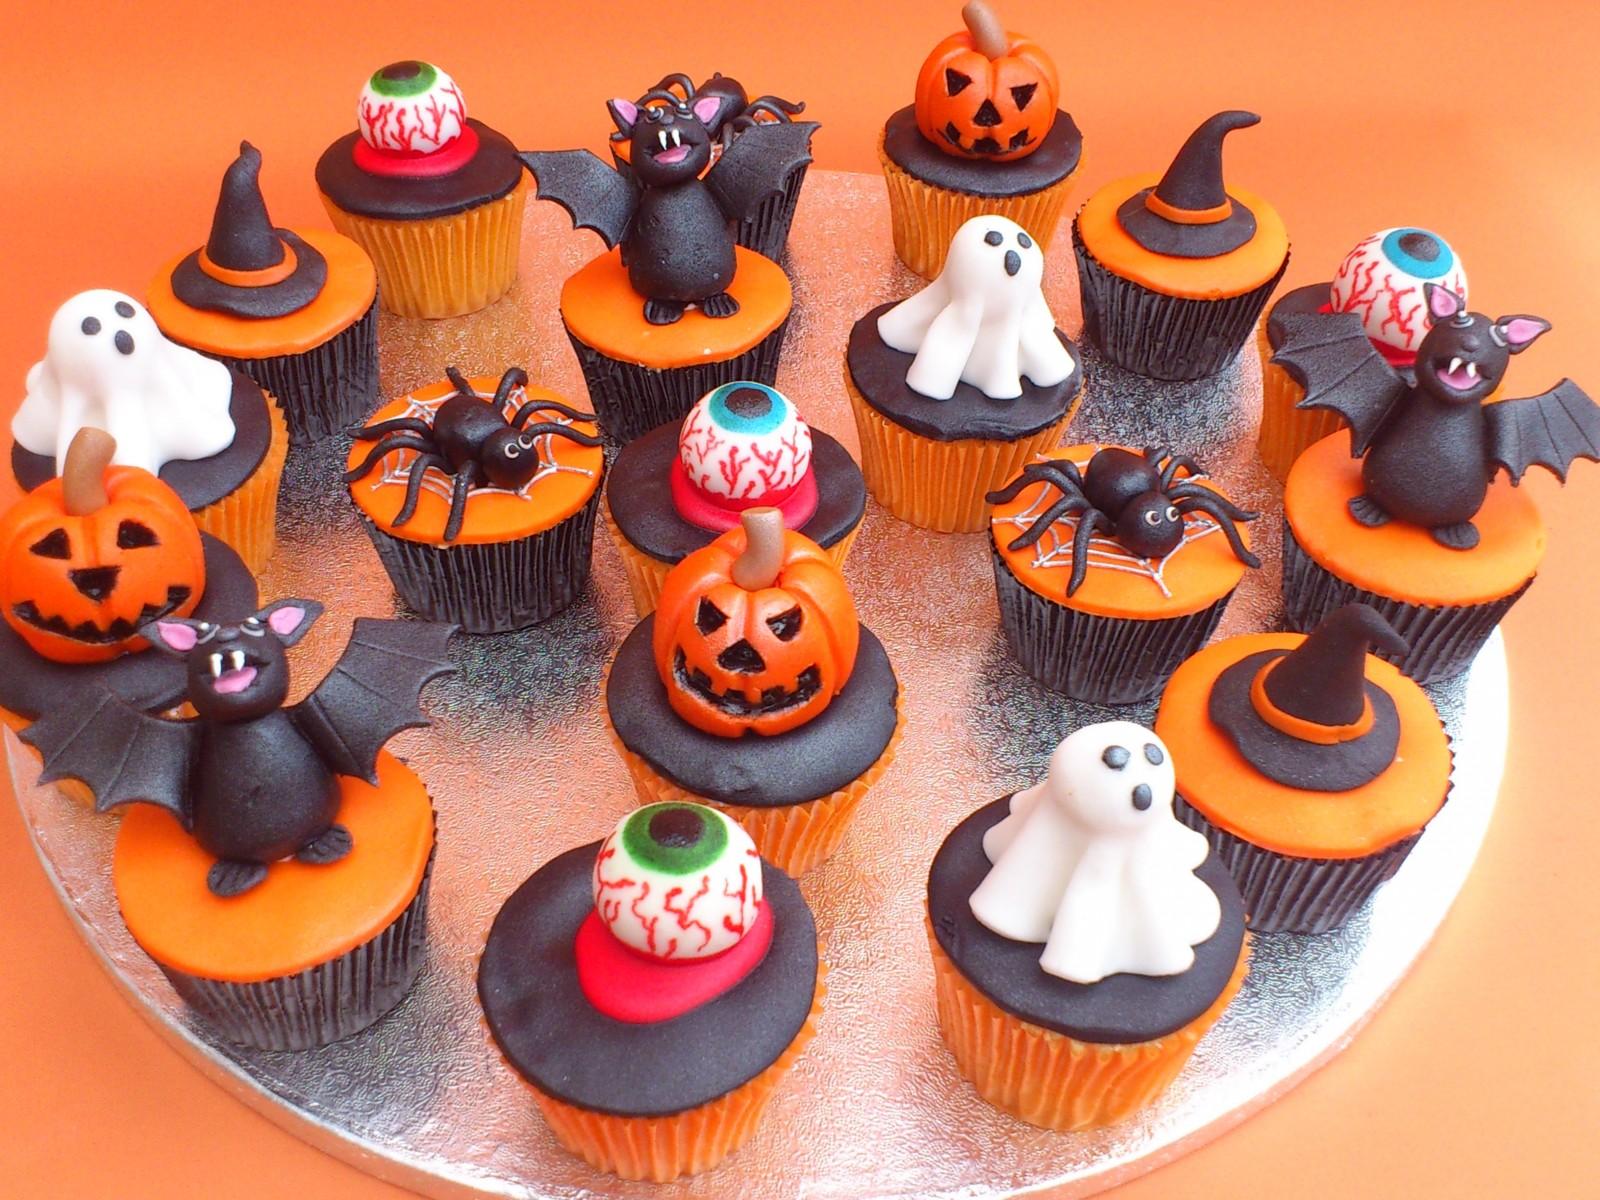 9 Photos of Bakery Halloween Cakes